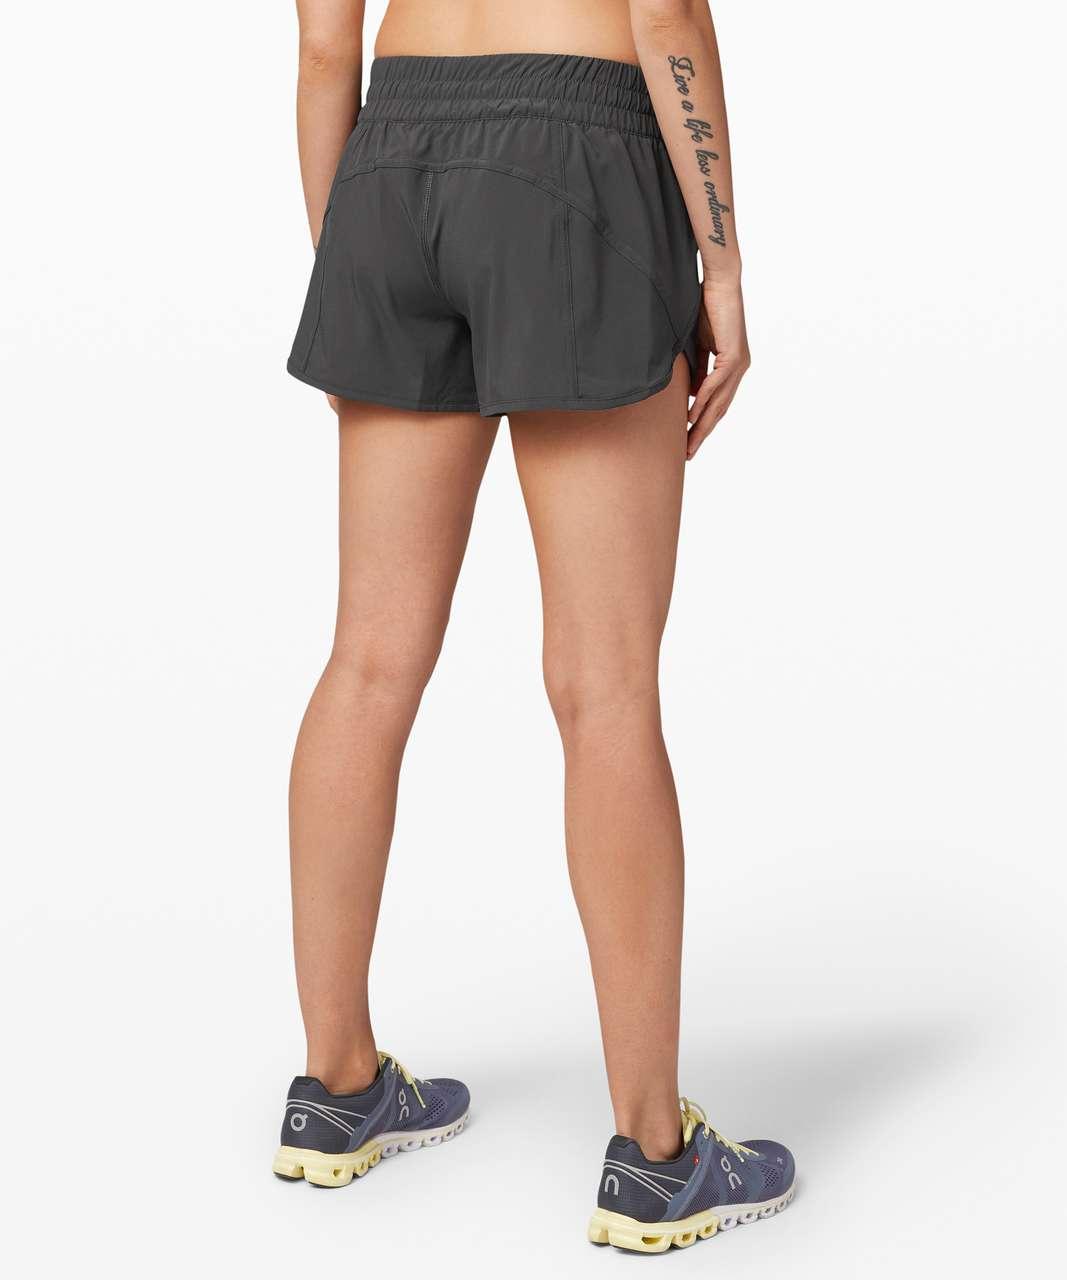 "Lululemon Tracker Short V *4"" - Graphite Grey"